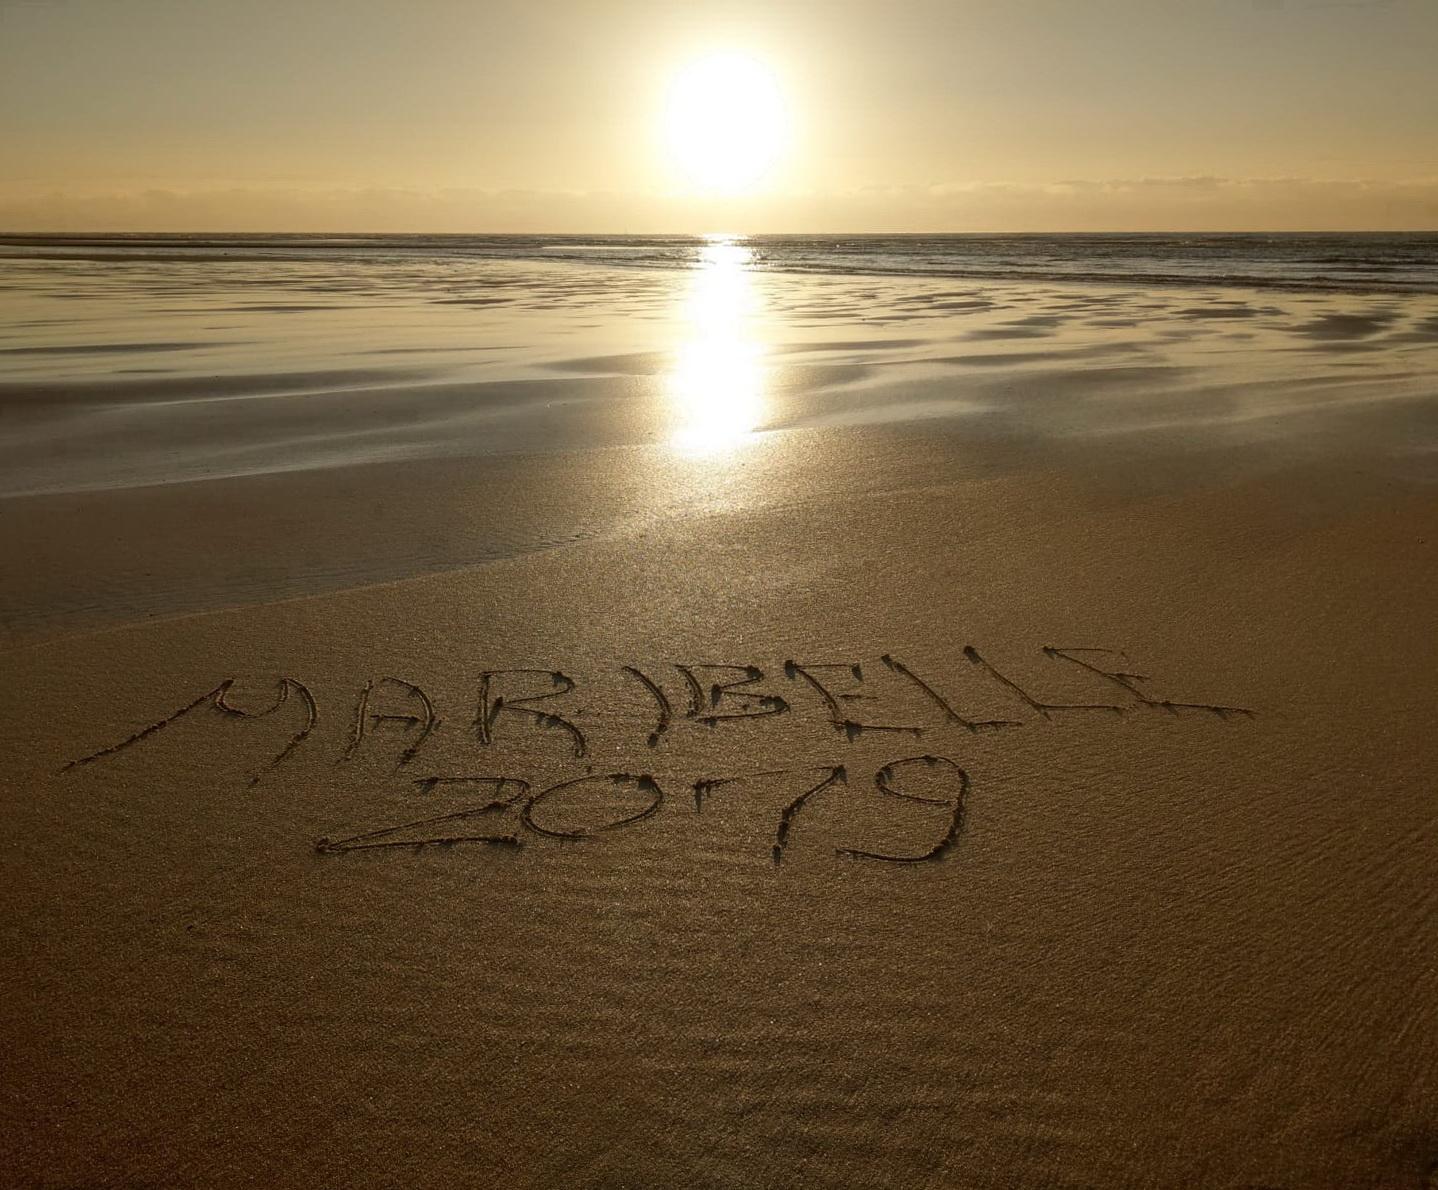 Maribelle 2019 Sonnenaufgang 5 xxxzd